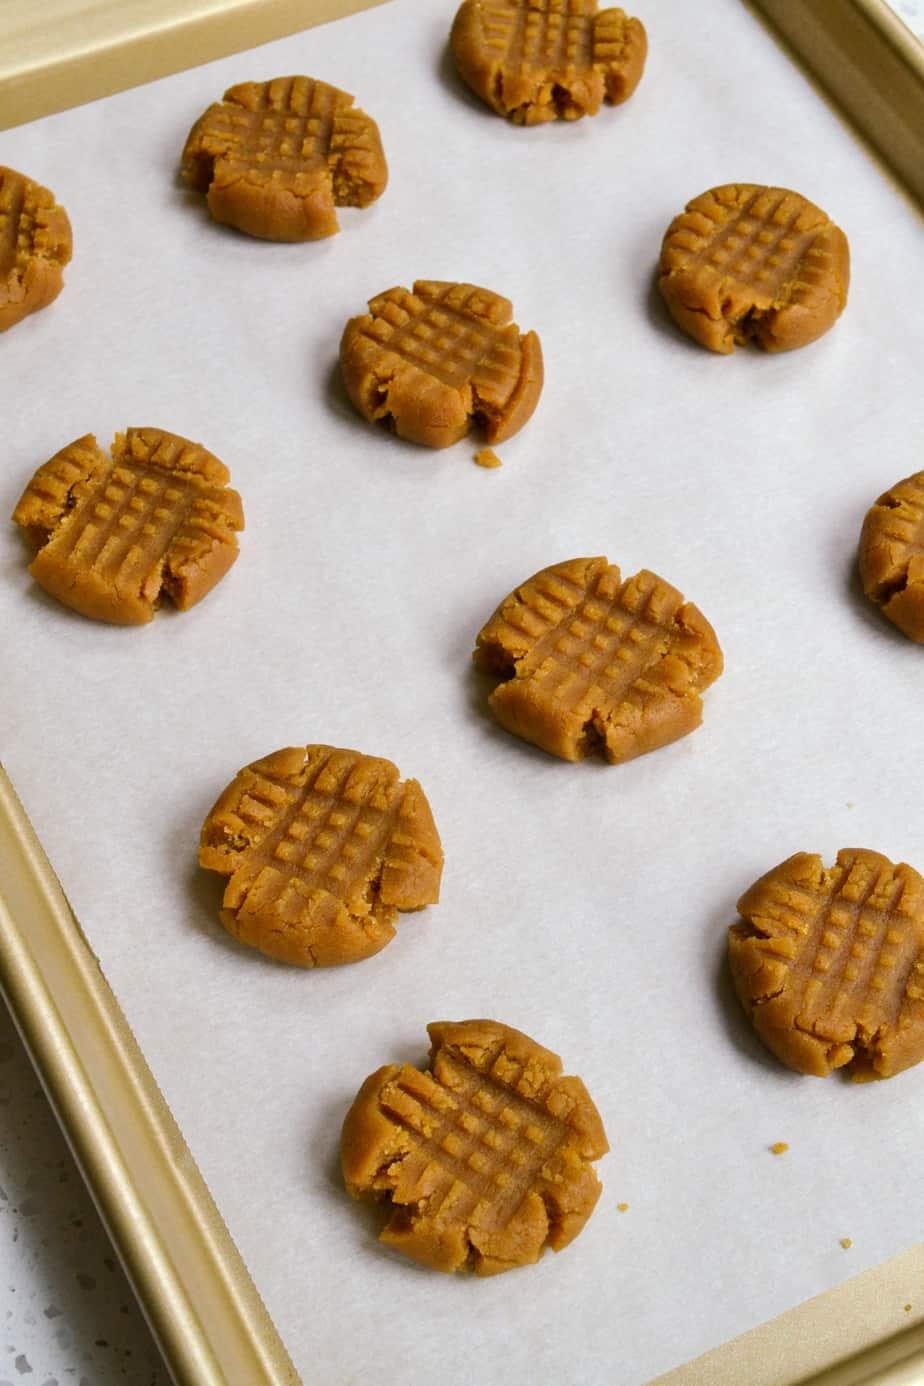 Peanut butter cookie dough prepped on a baking sheet.